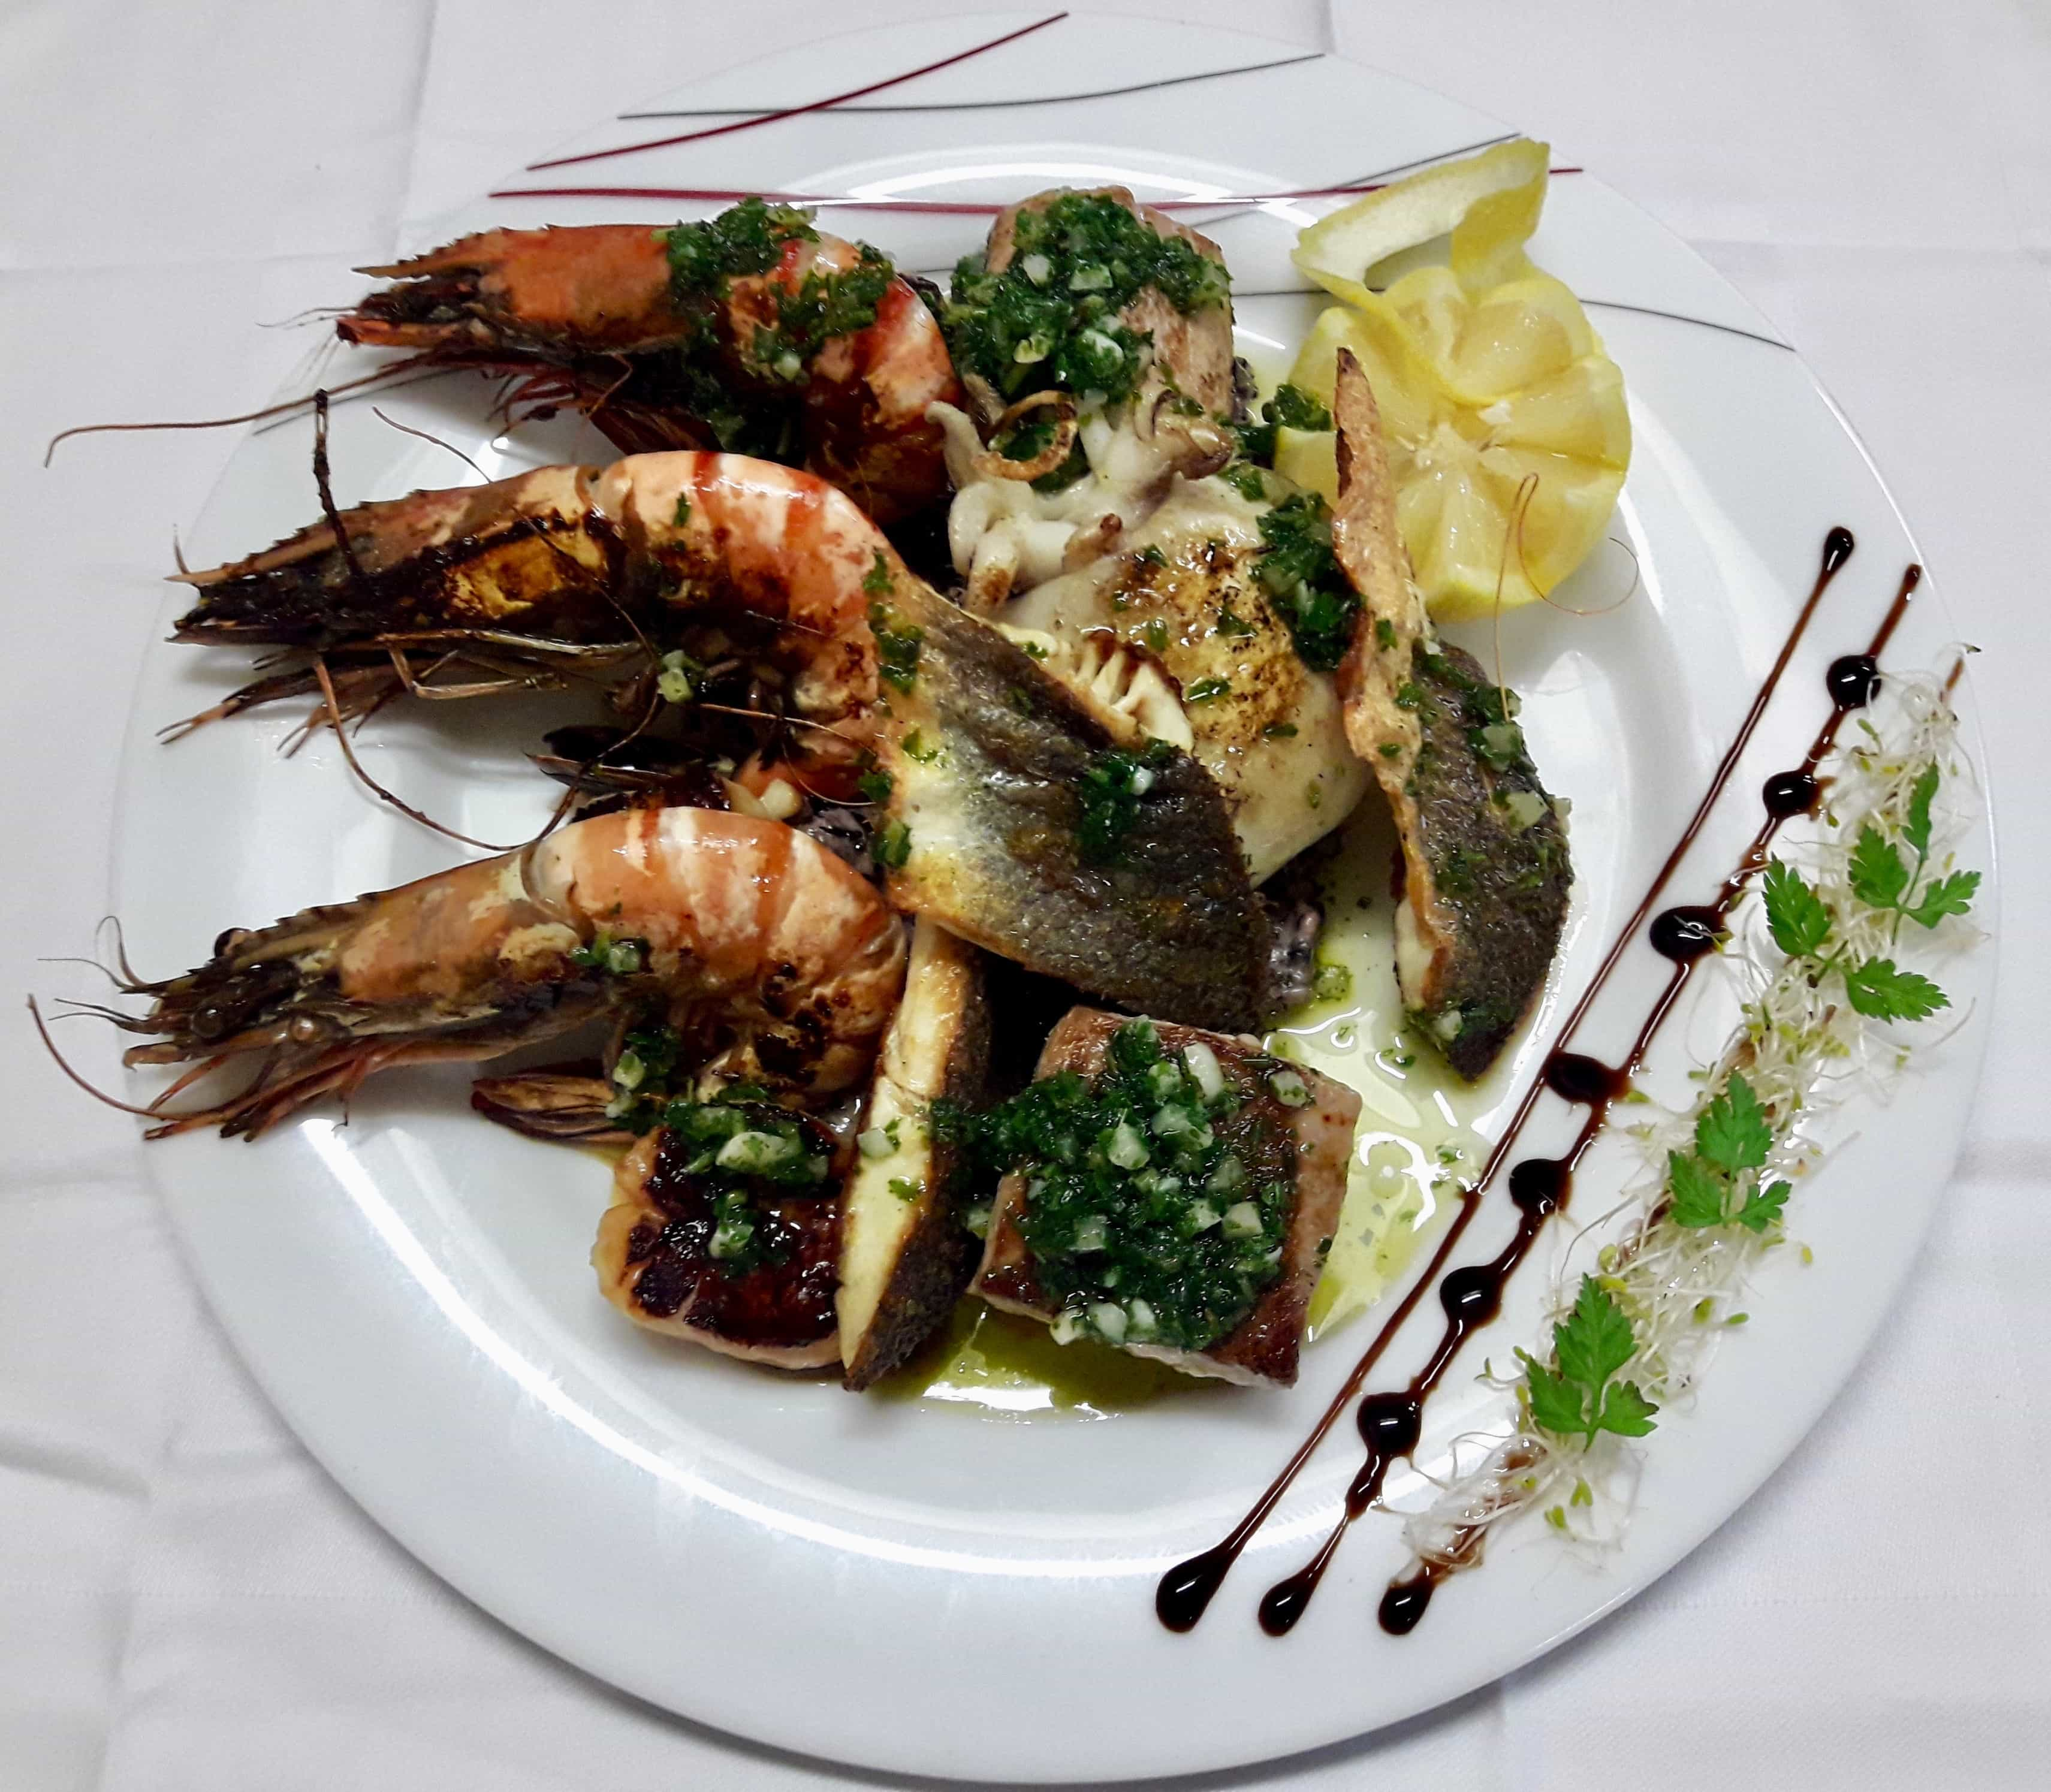 Parillada de poissons grillés